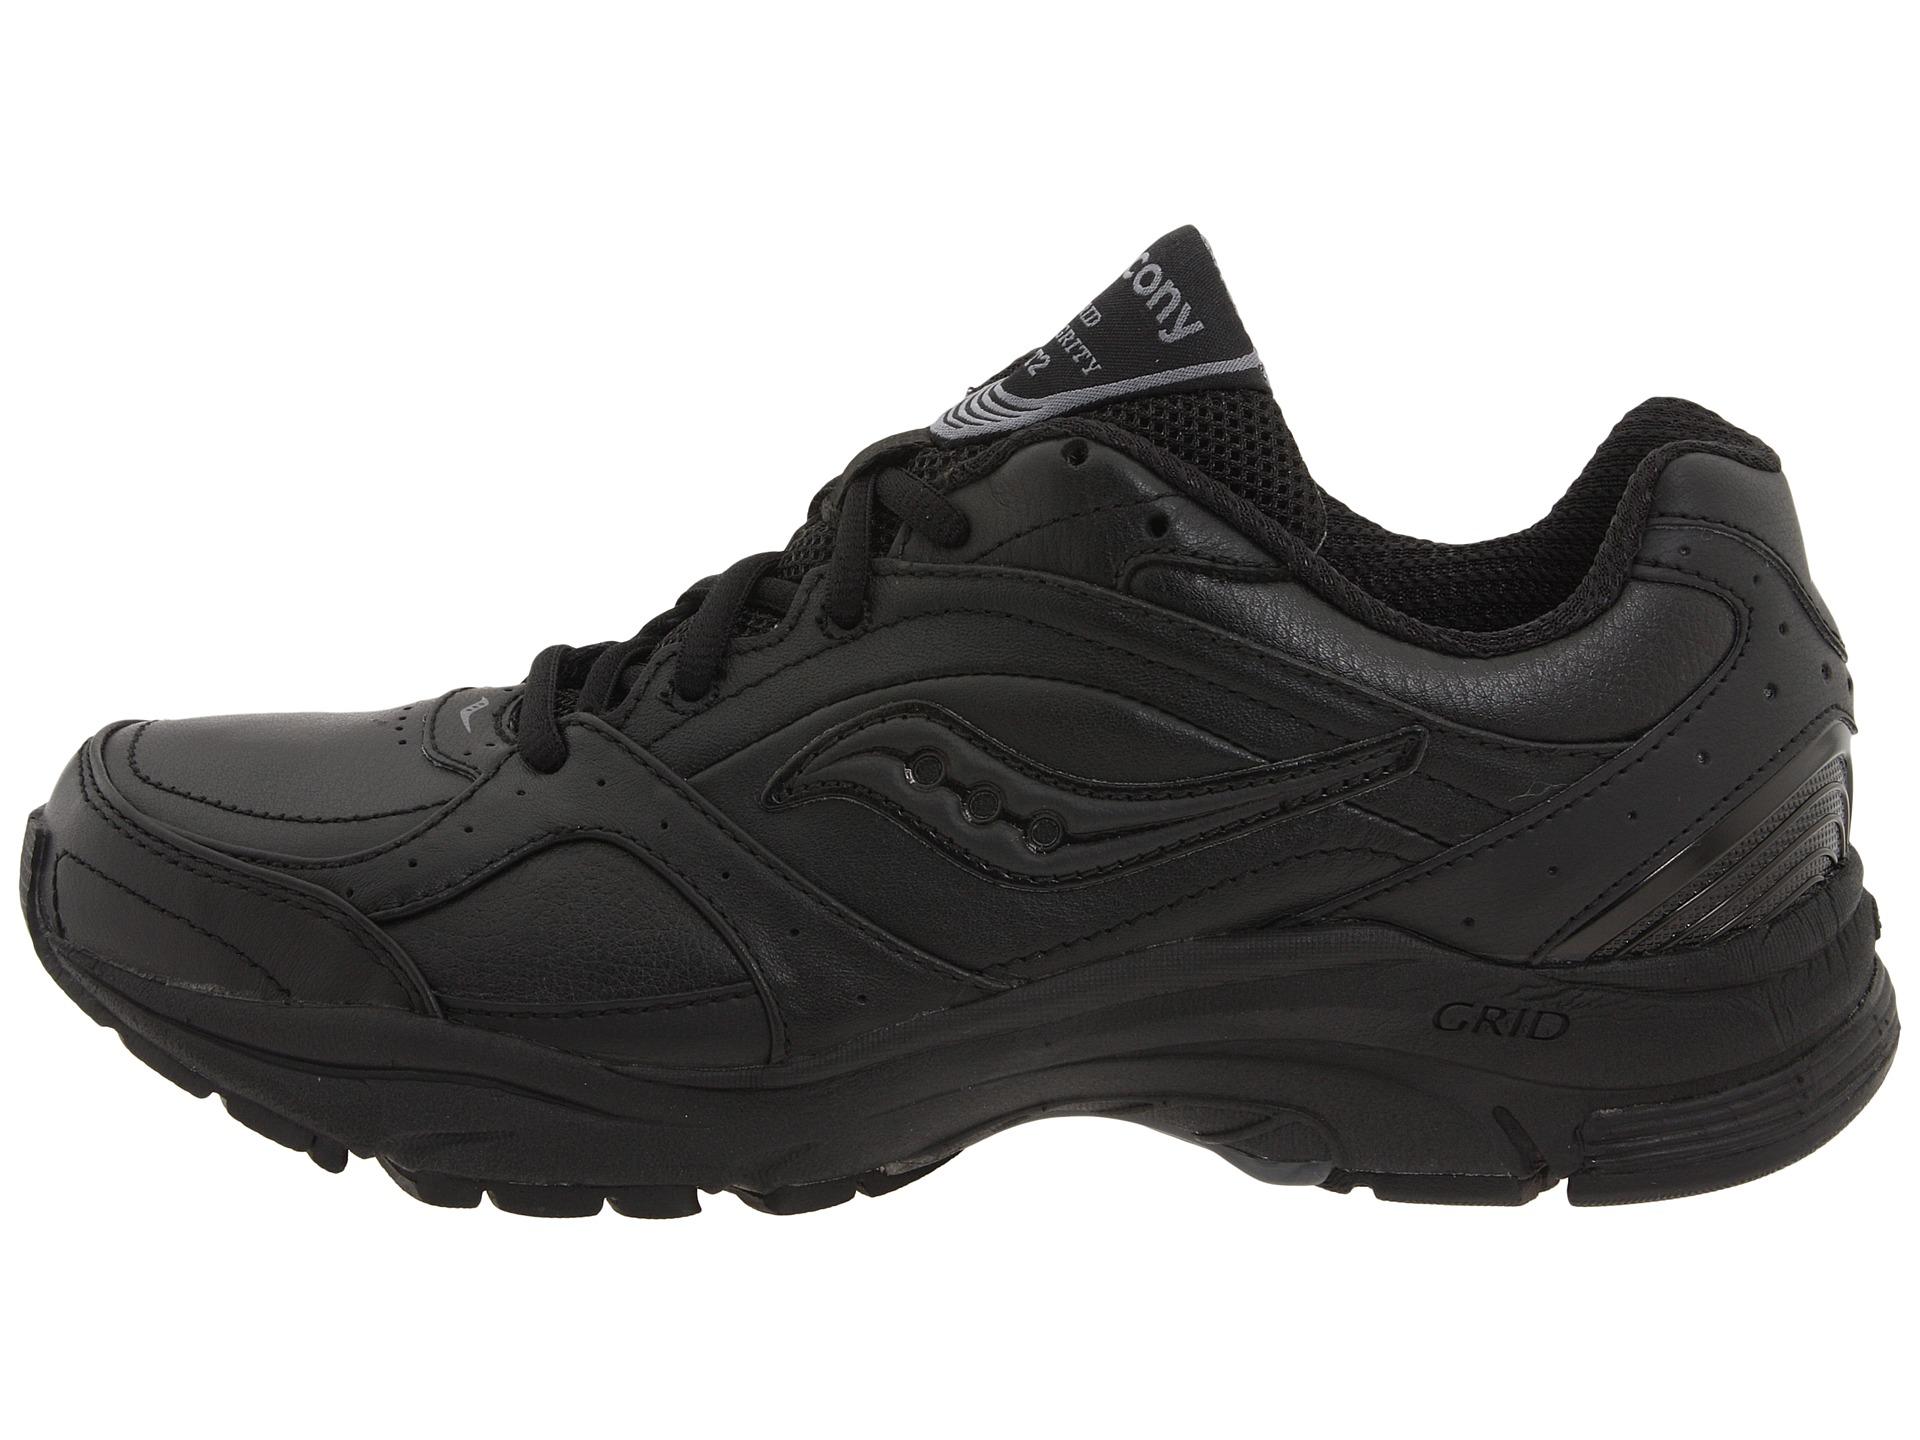 Saucony Black Walking Shoes